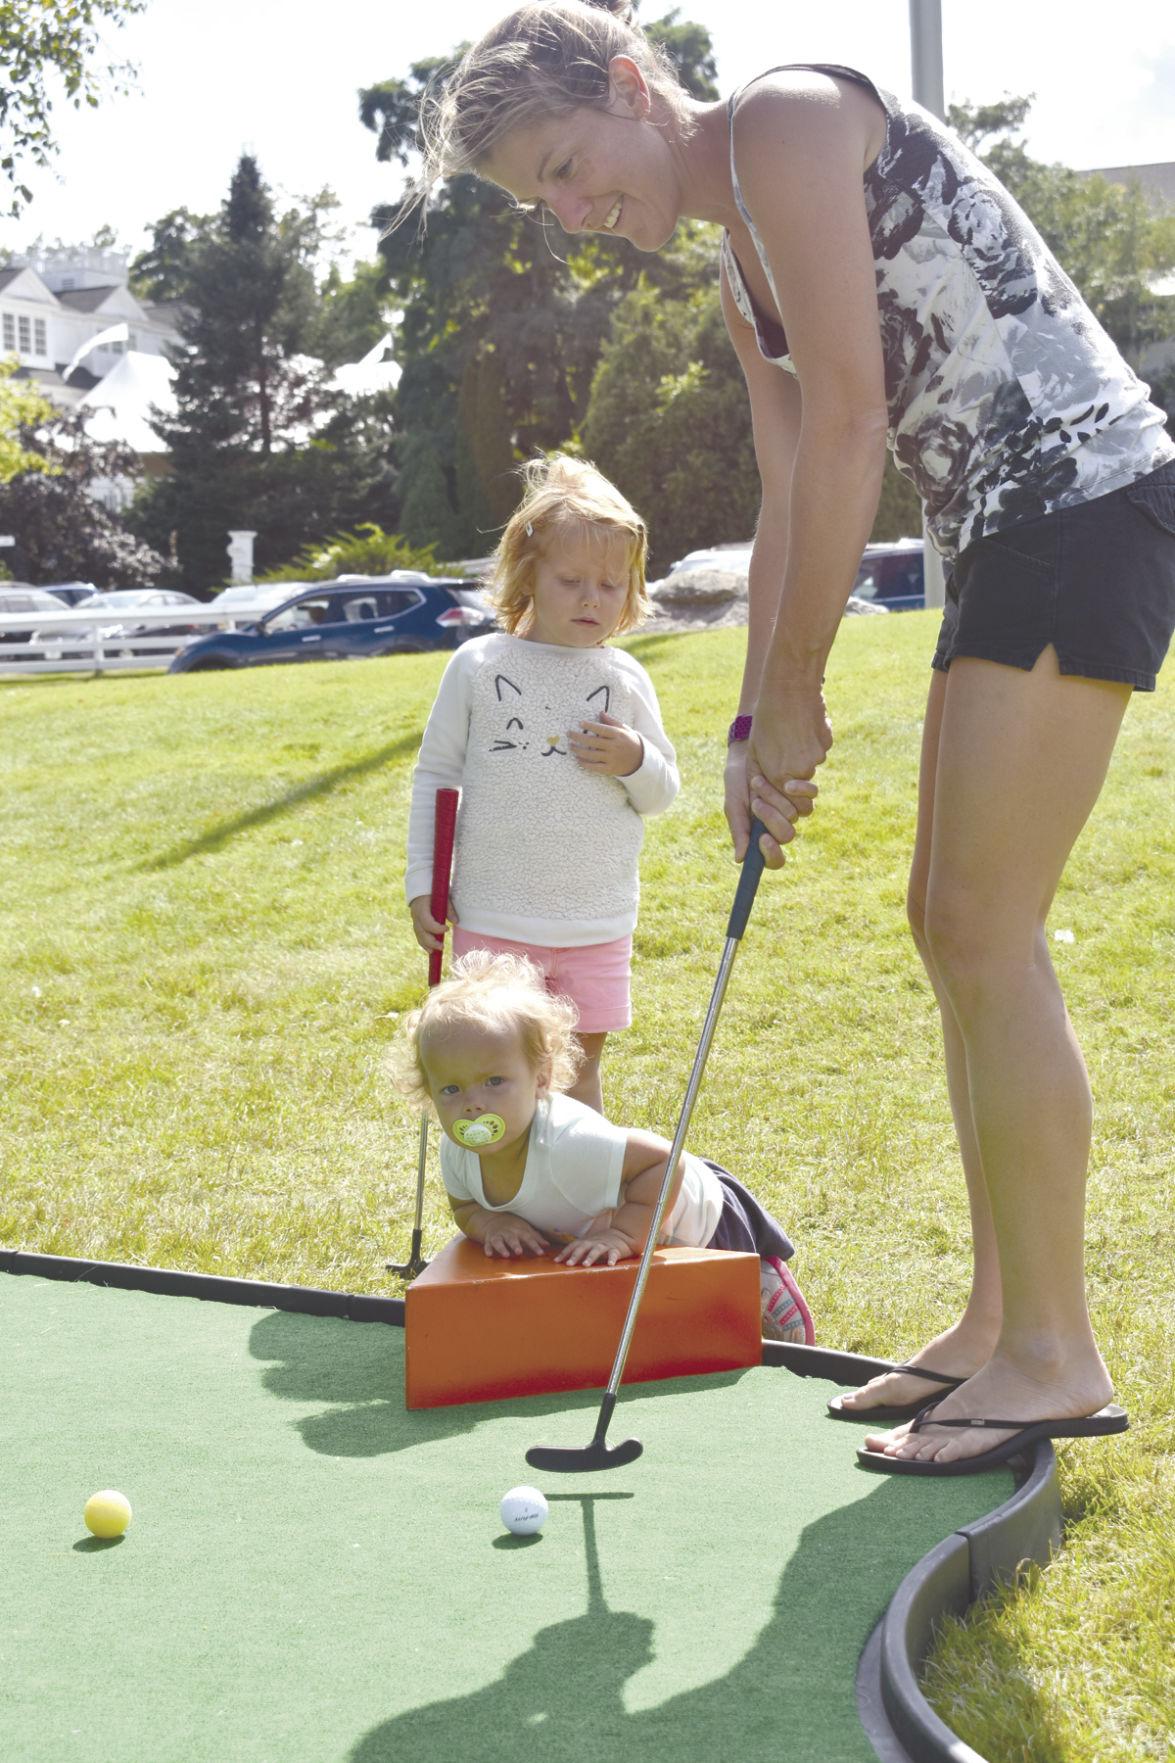 08-14 Skate park mini golf Lacey